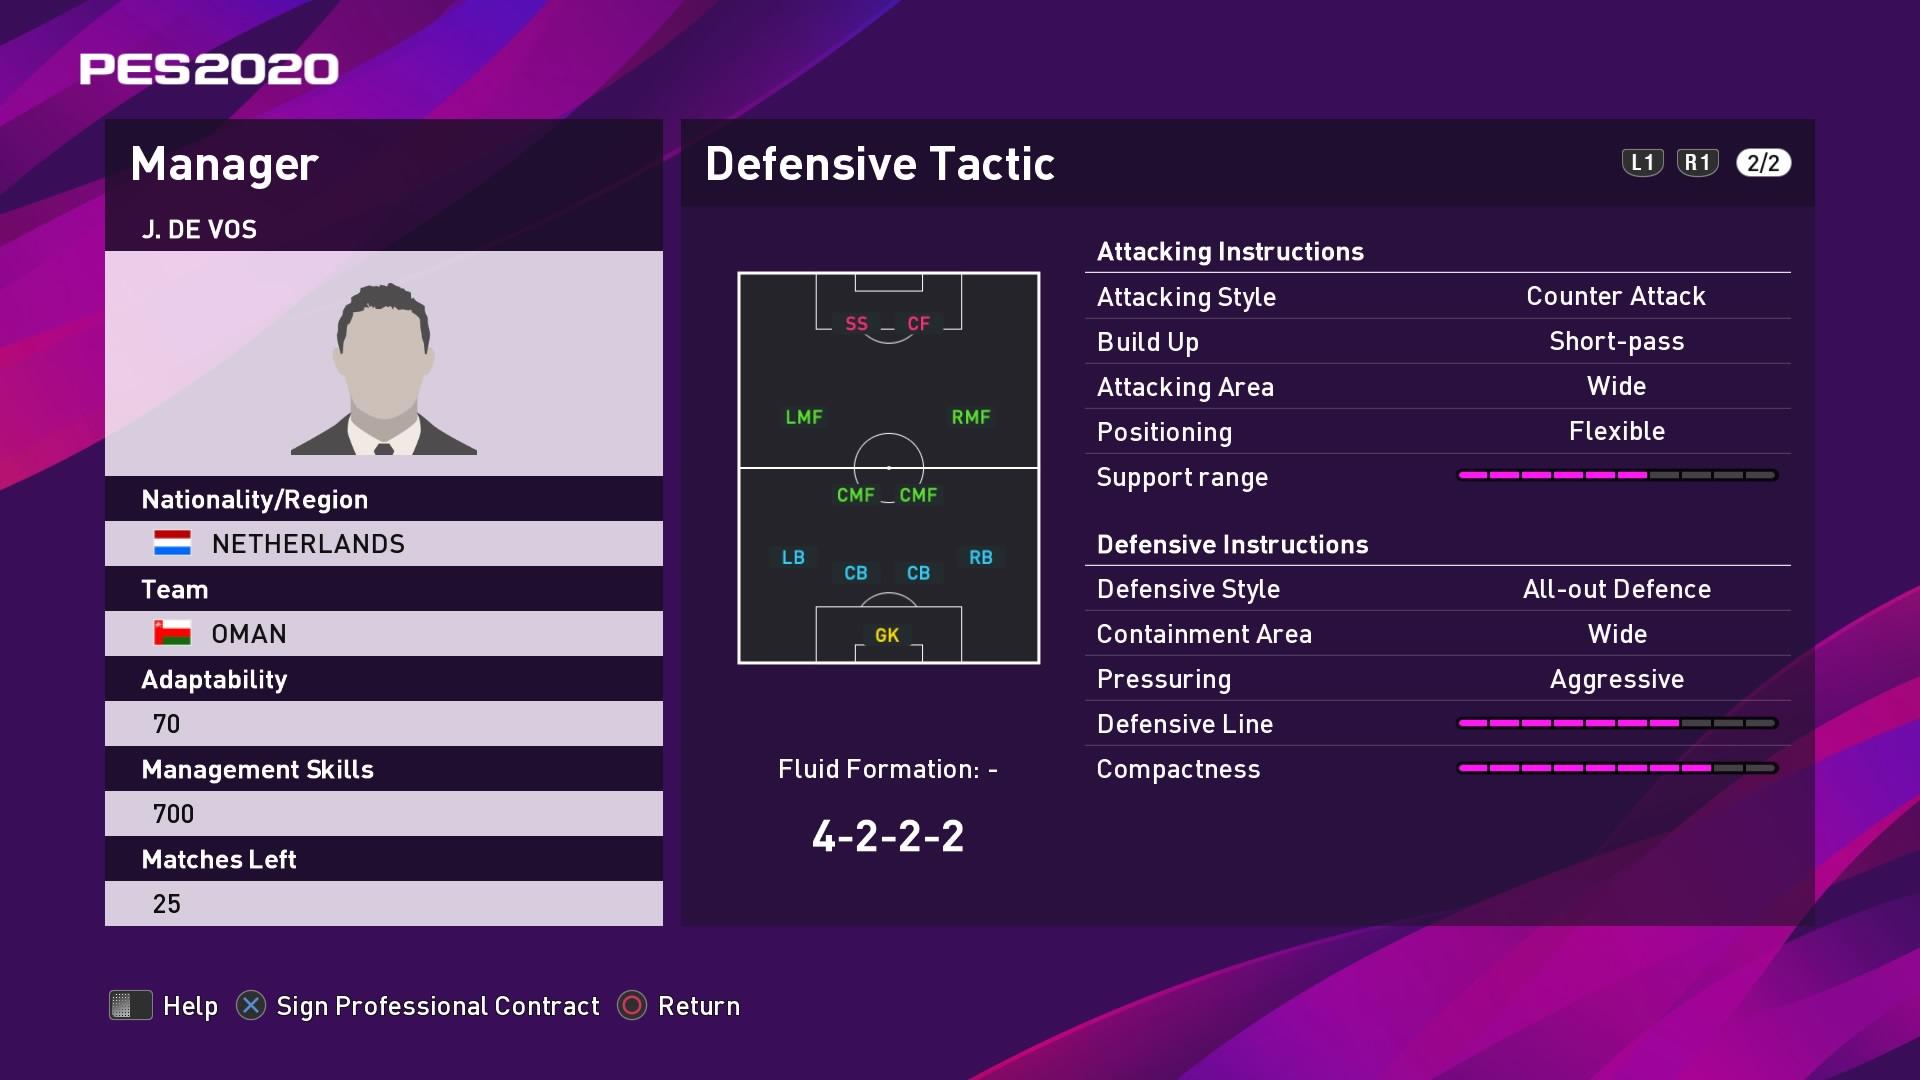 J. De Vos (Erwin Koeman) Defensive Tactic in PES 2020 myClub